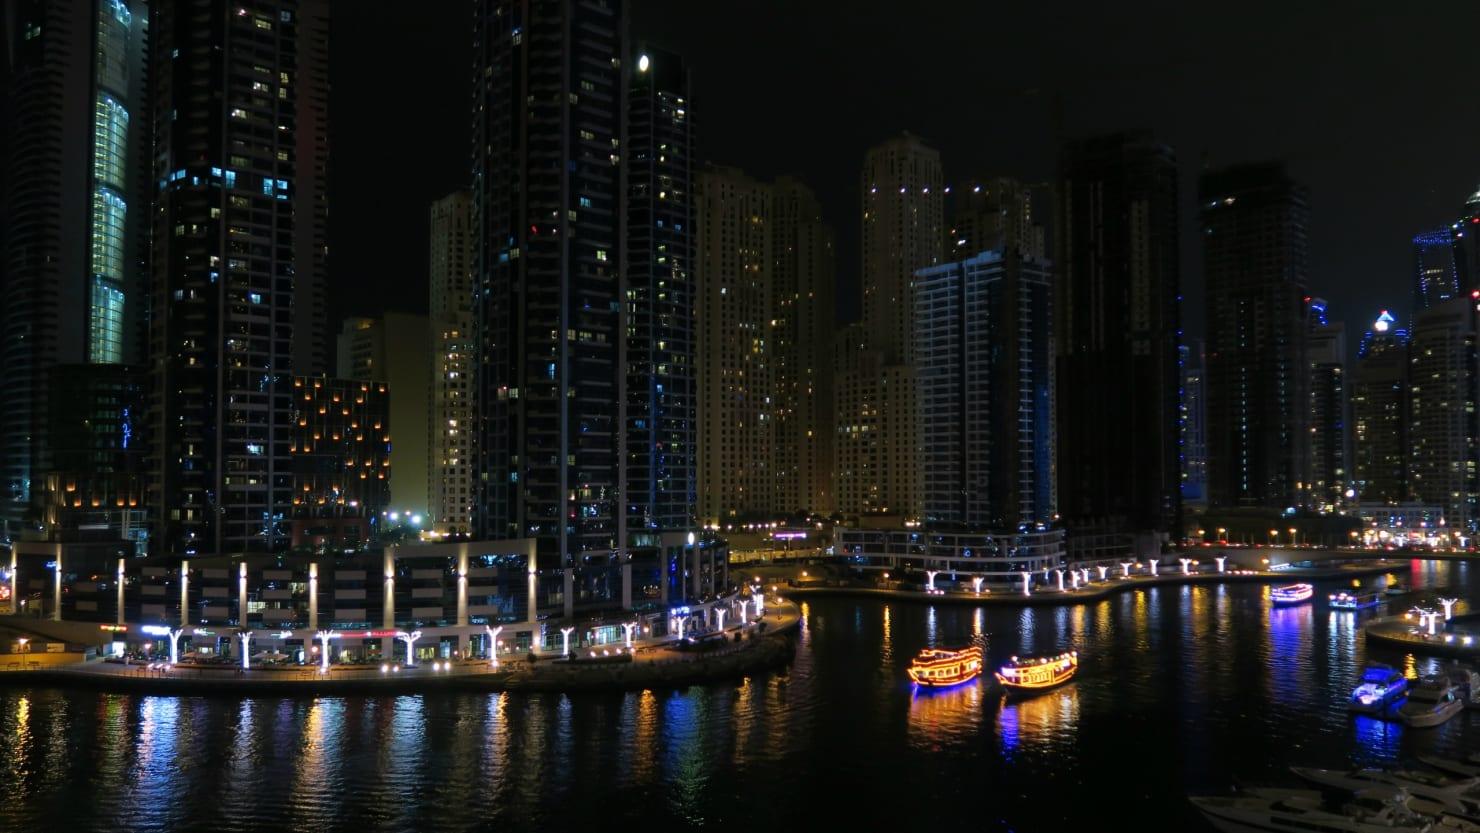 British Tourist Faces Jail in Dubai for Brushing Against Man in Bar